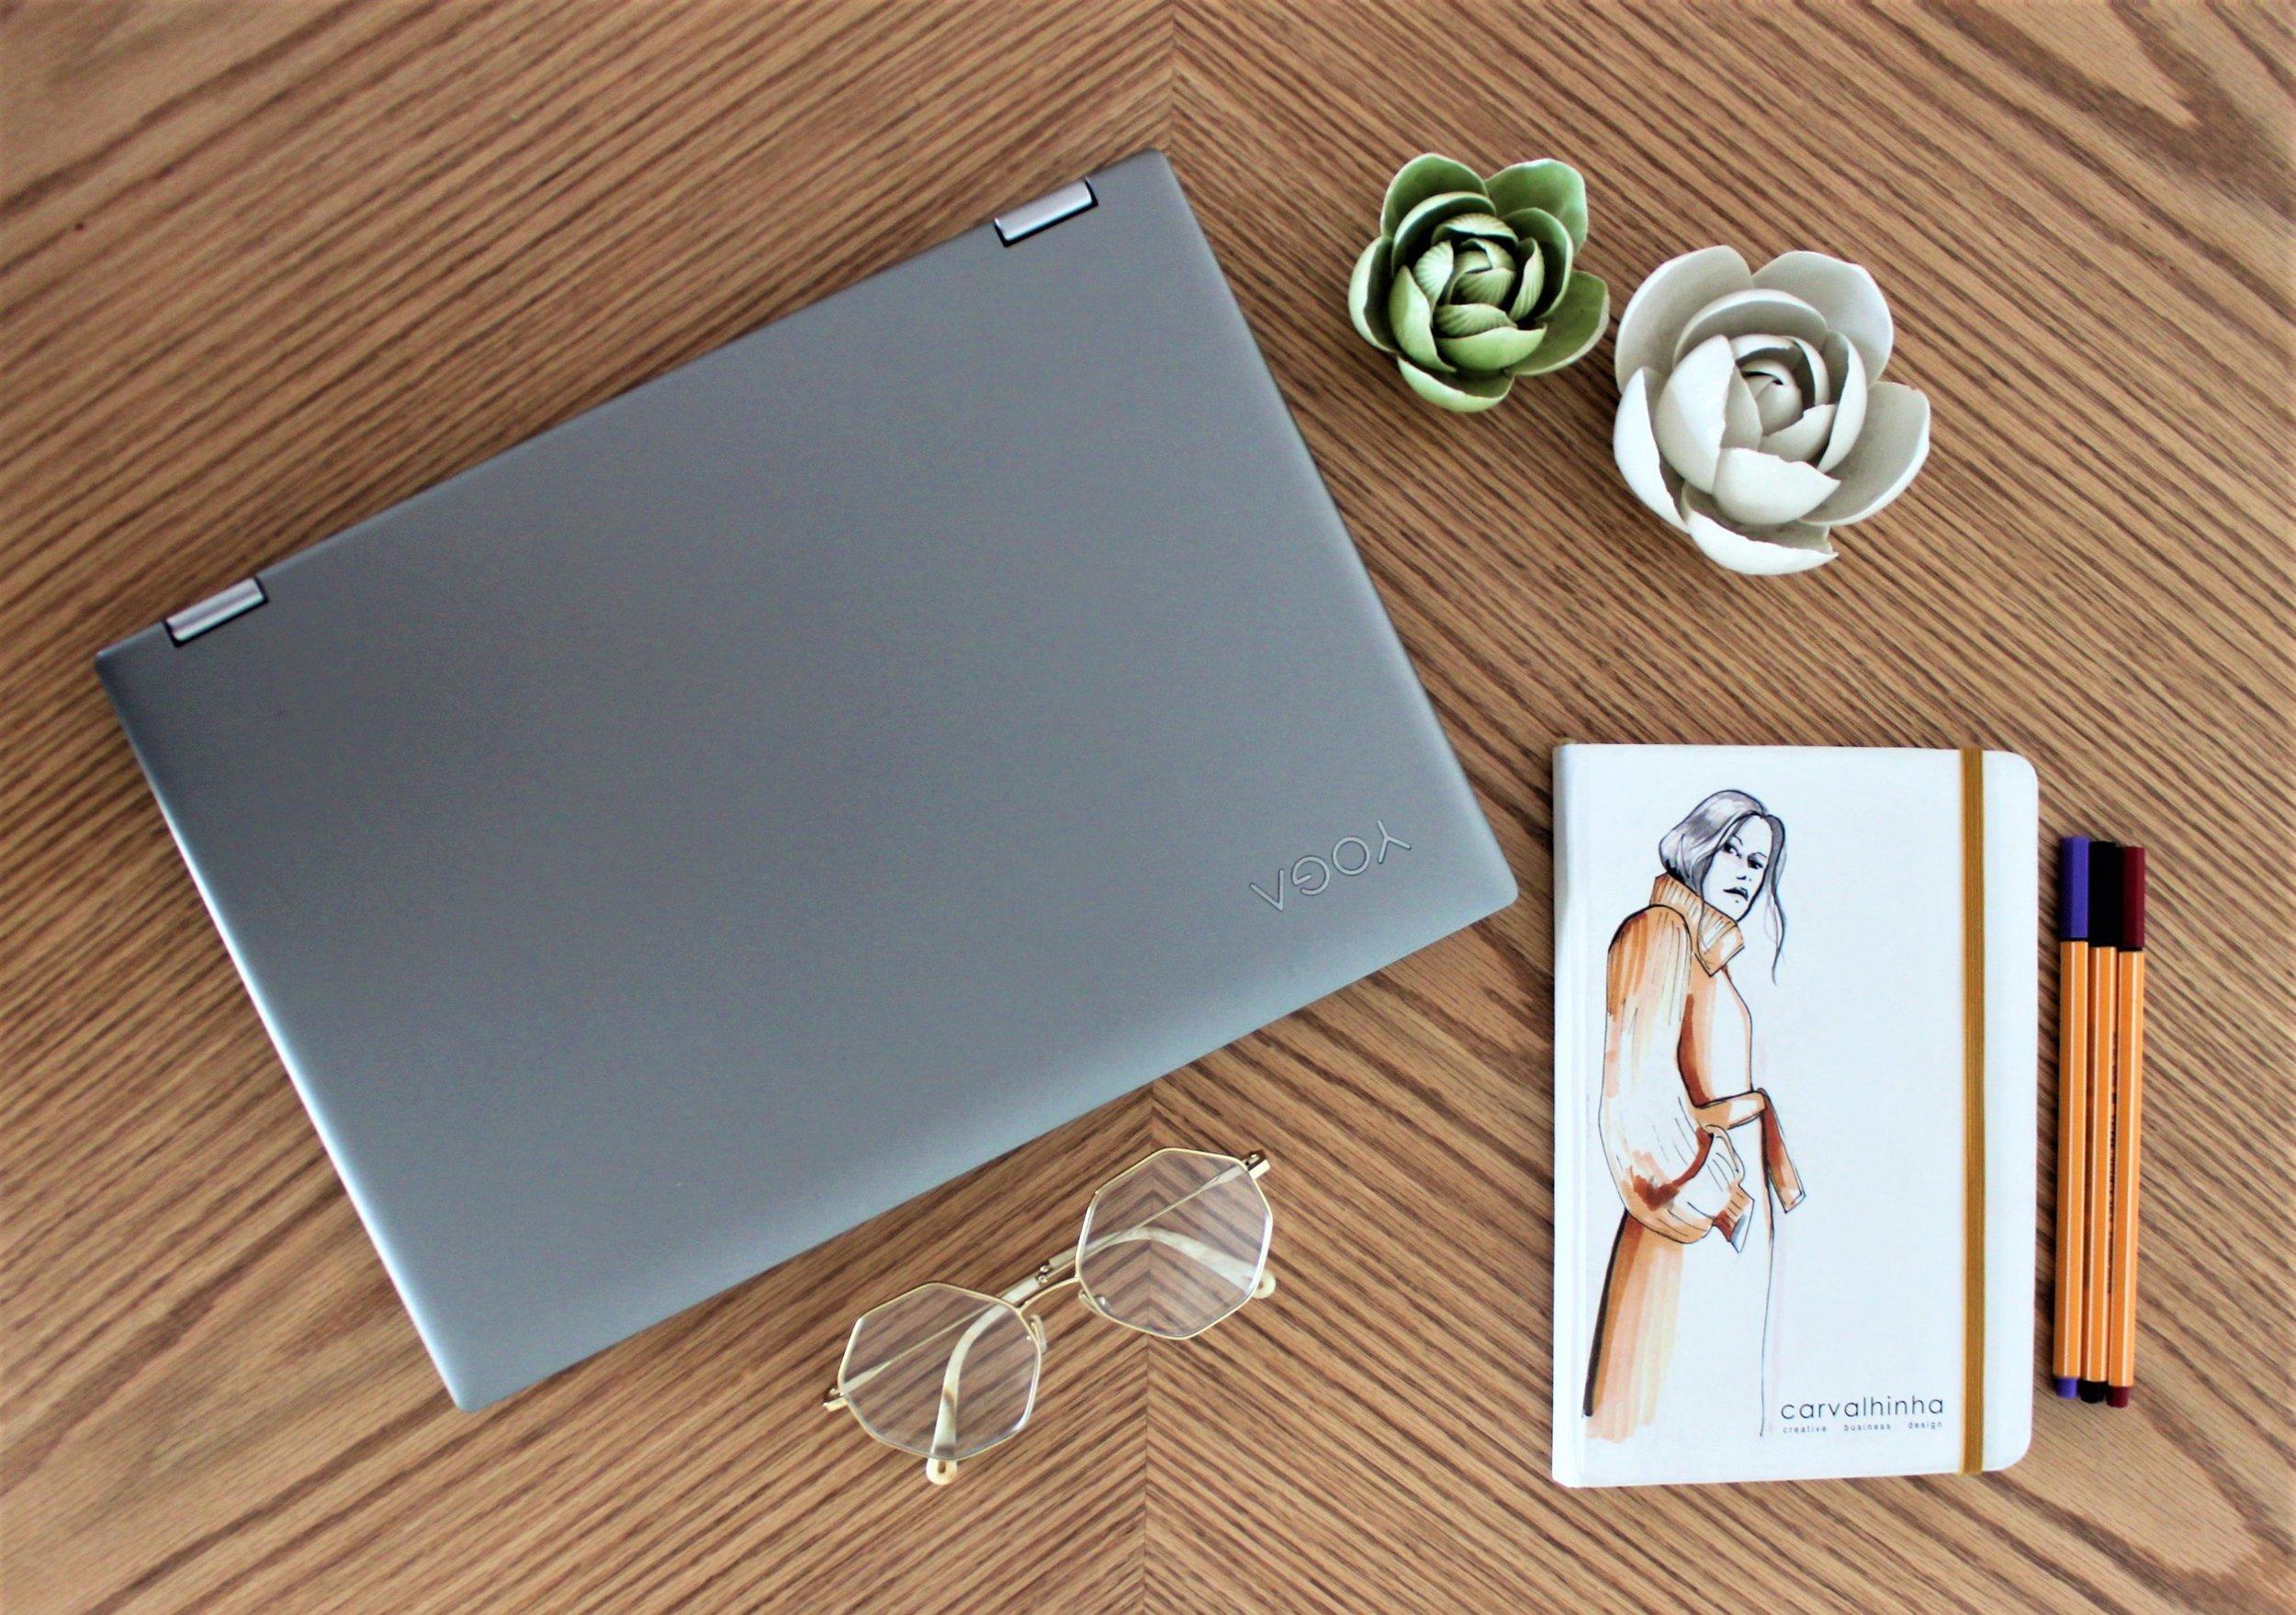 IMG 6606+%283%29 - Interview: Marilia Carvalhinha, Consultora estratégica e coordenadora da pós de moda e varejo na Faap.